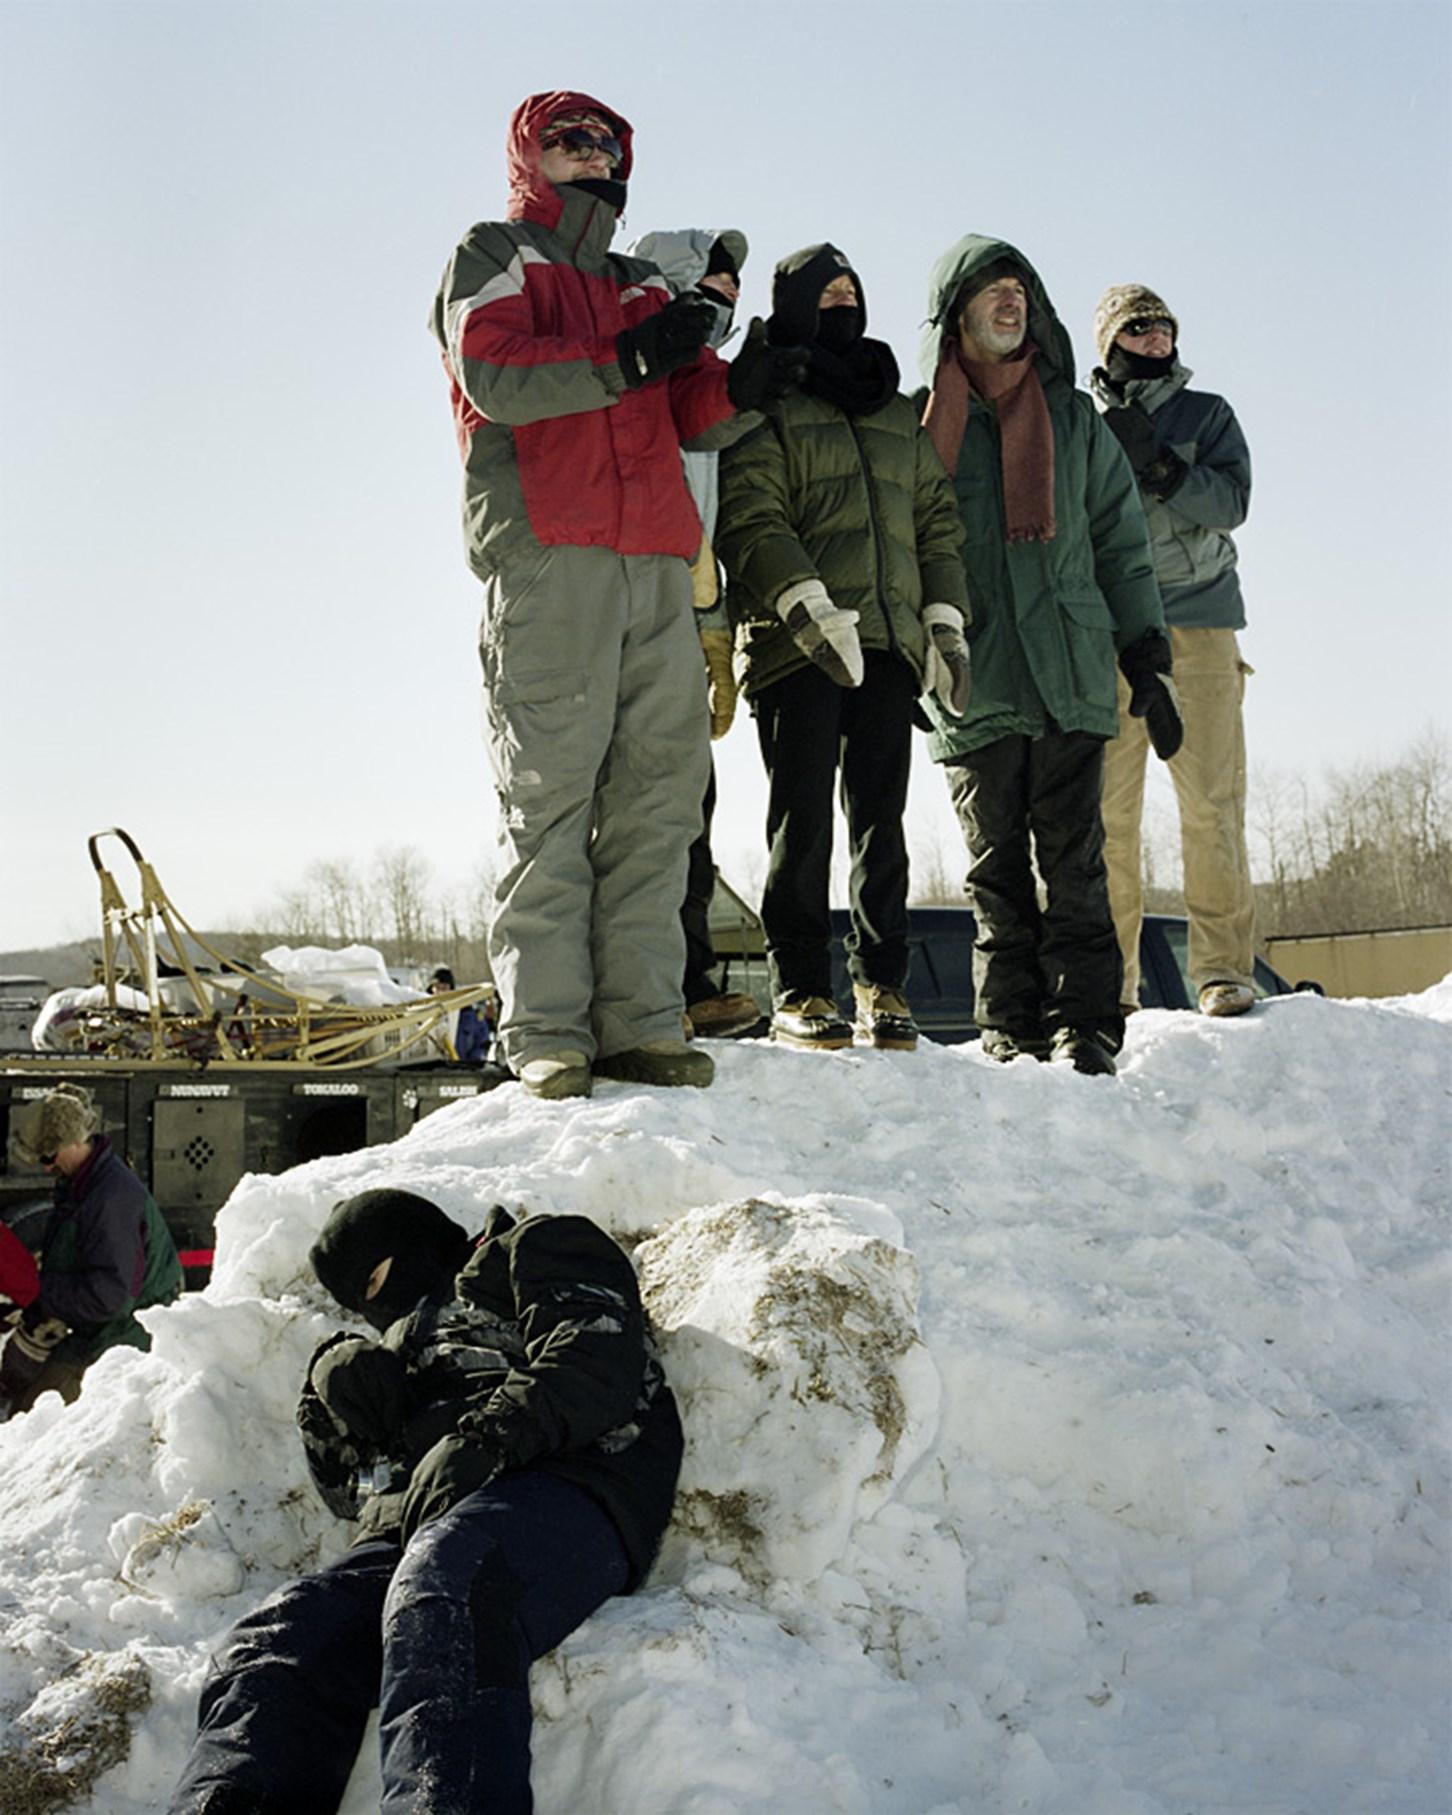 Dead Boy in The Snow, January 2010